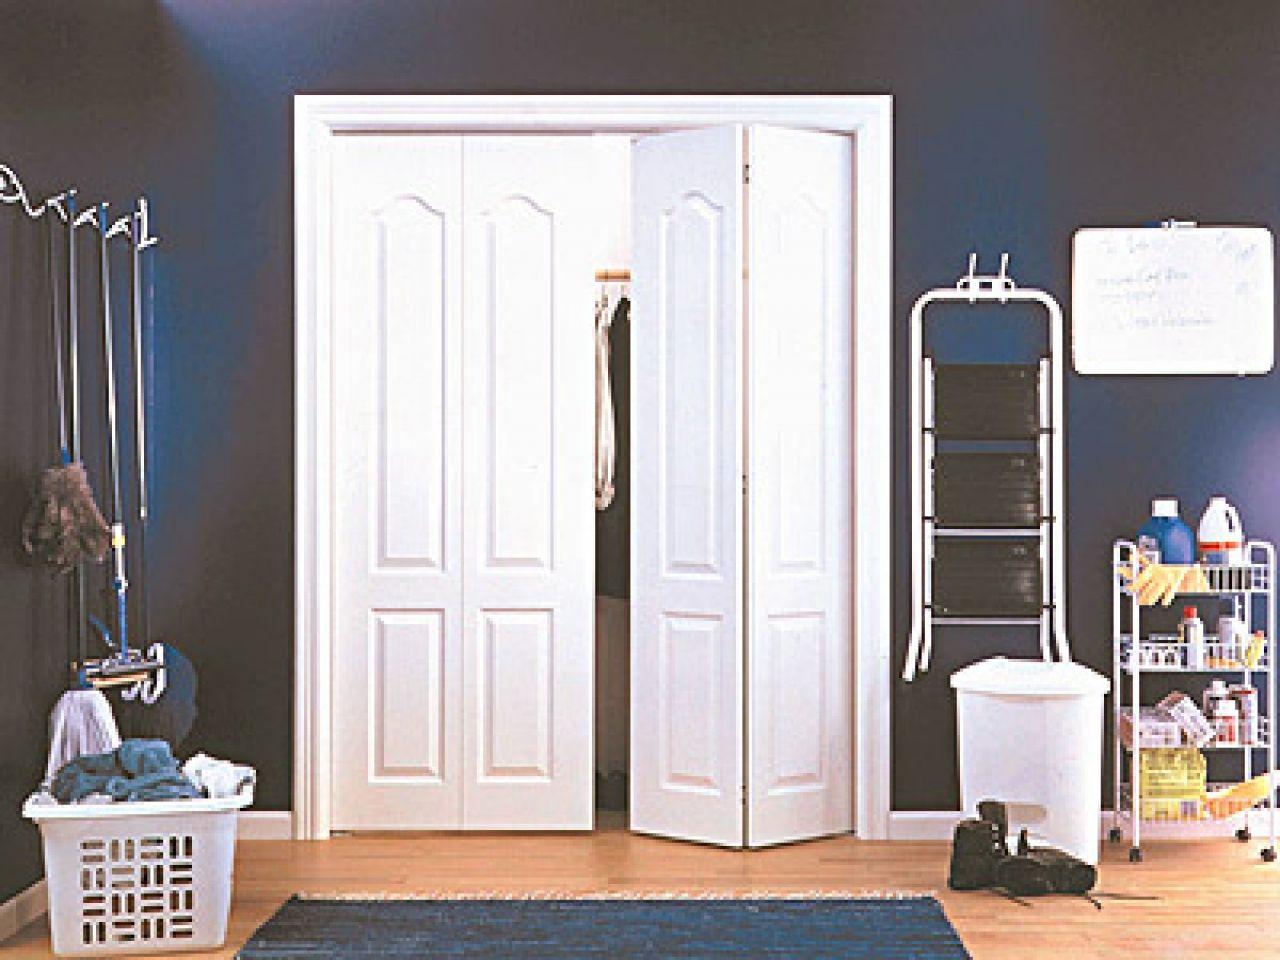 Top 30 Closet Door Ideas To Try To Make Your Bedroom Tidy And Spacious Closet Door Paint Closet Door Panels Closet Door Light Switch Closet Door Ideas Cheap